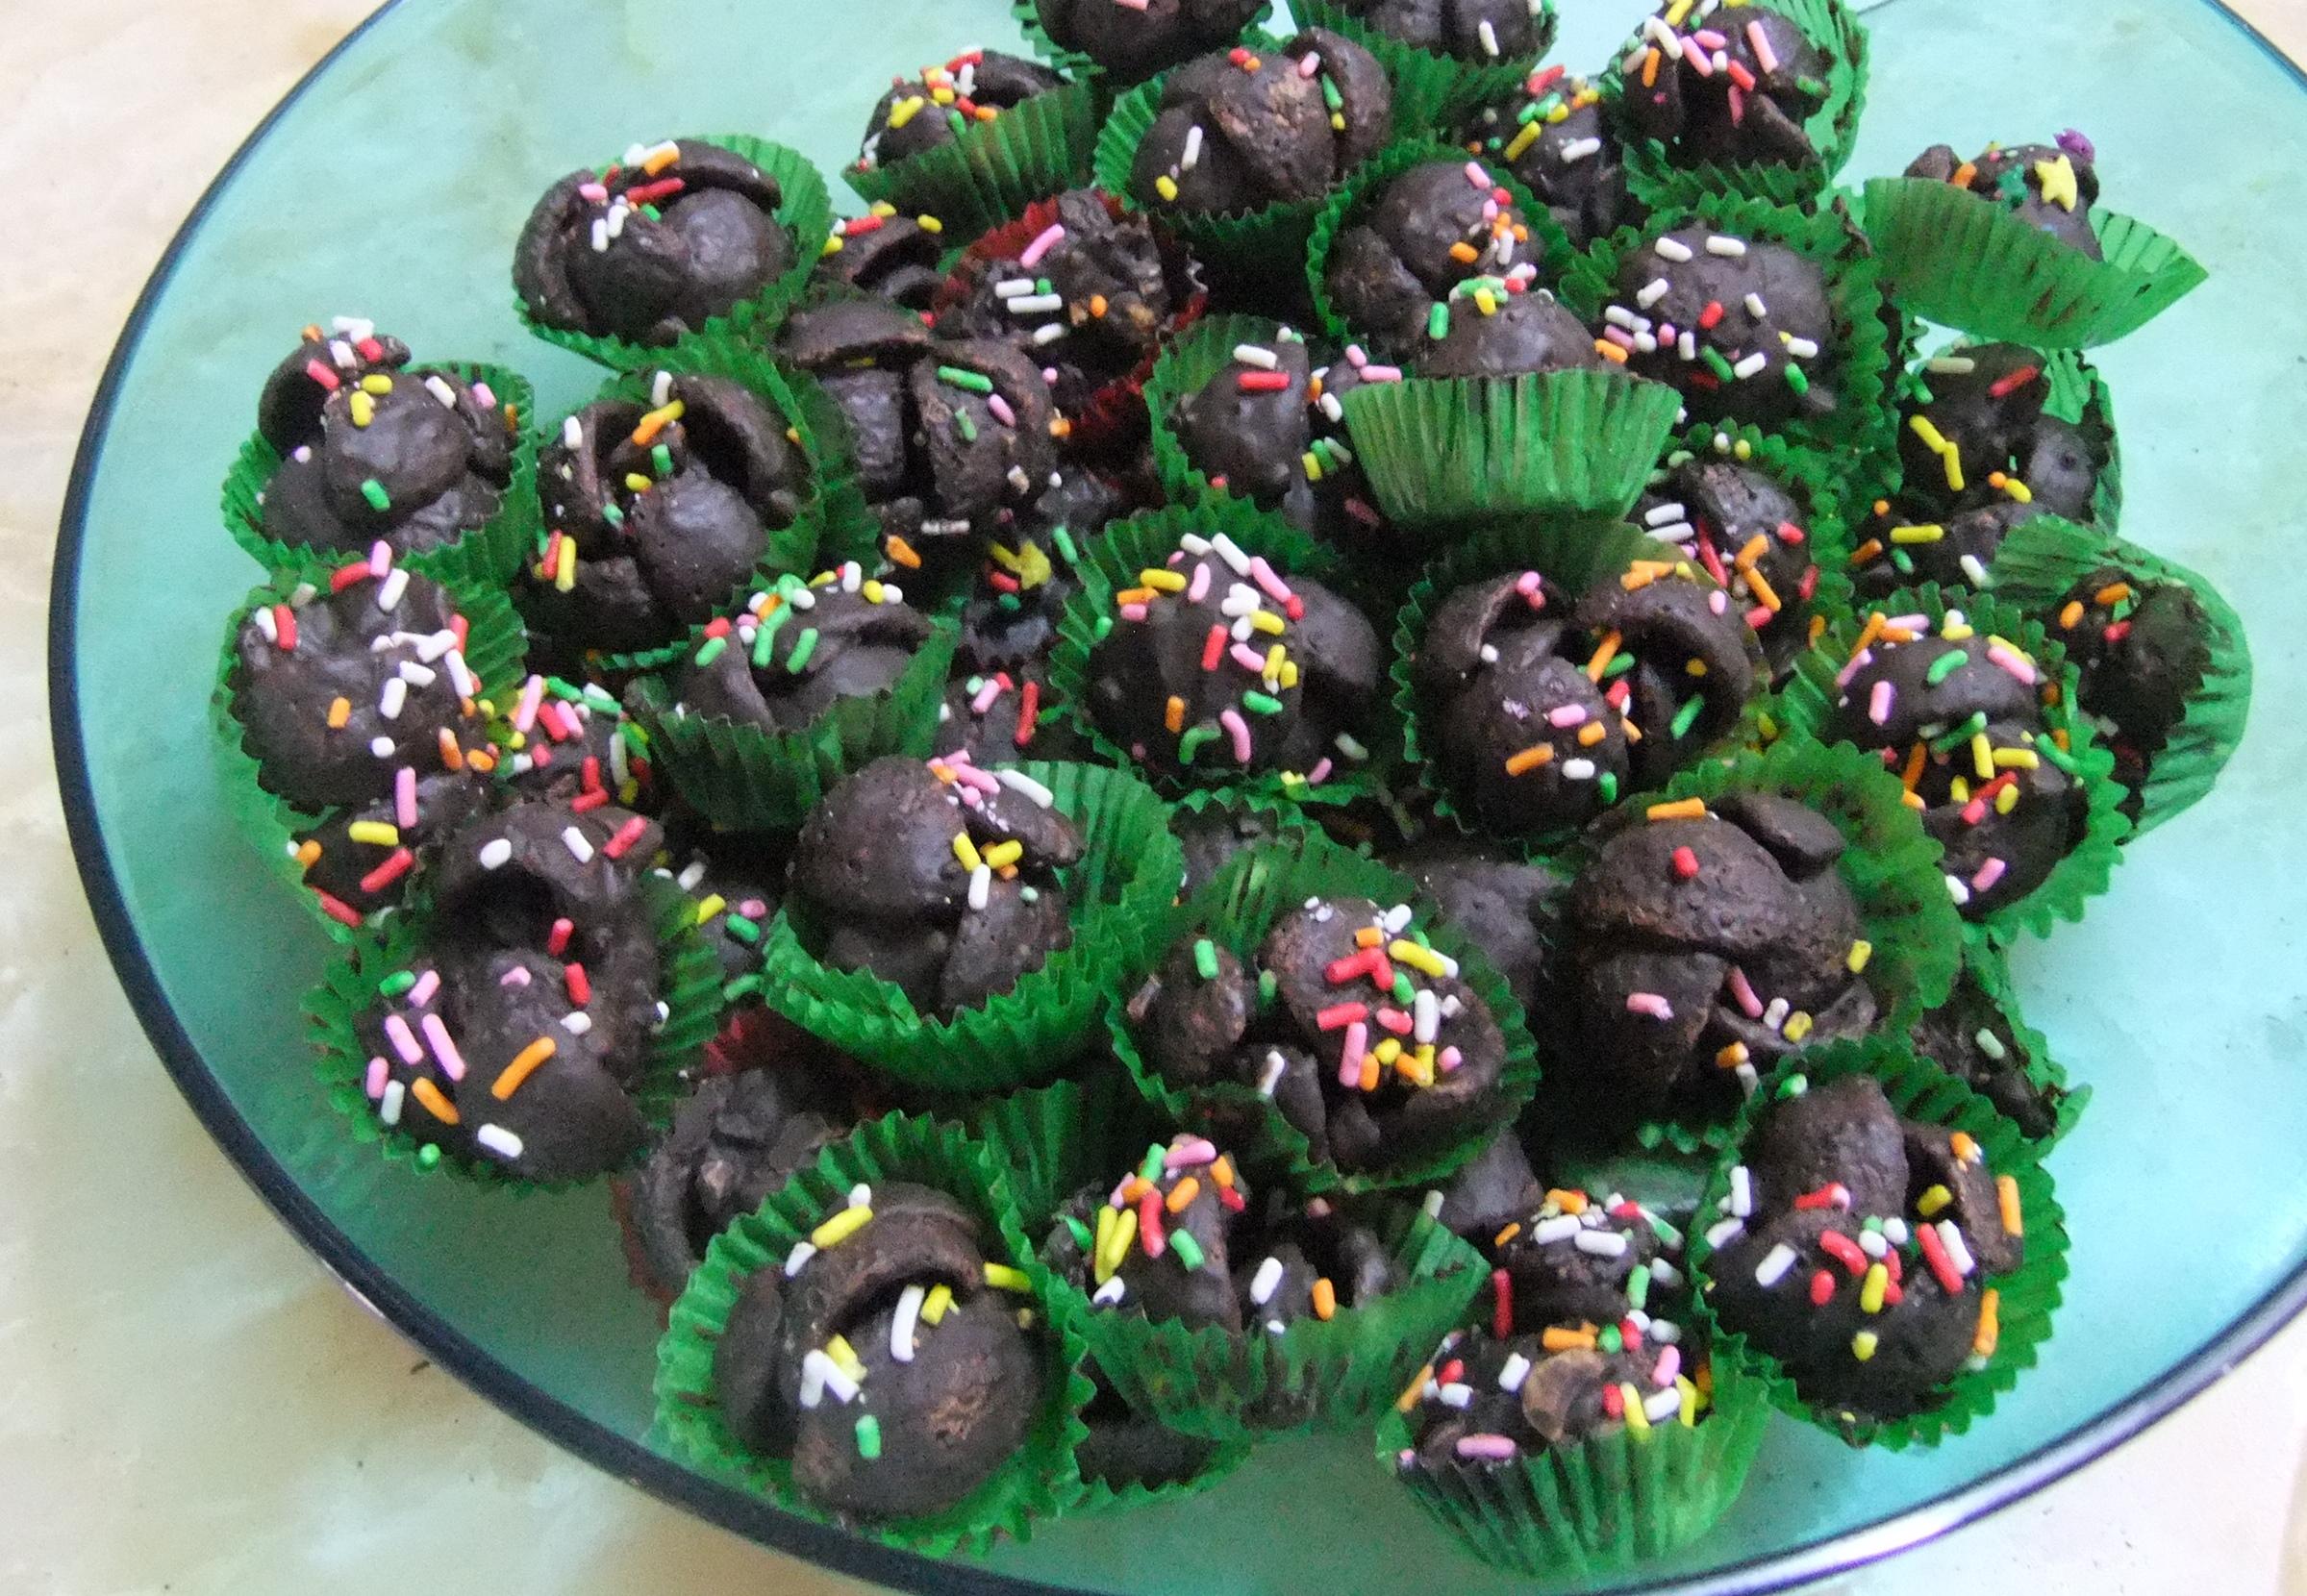 File:Kue kering Koko Krunch siram coklat.JPG - Wikimedia Commons